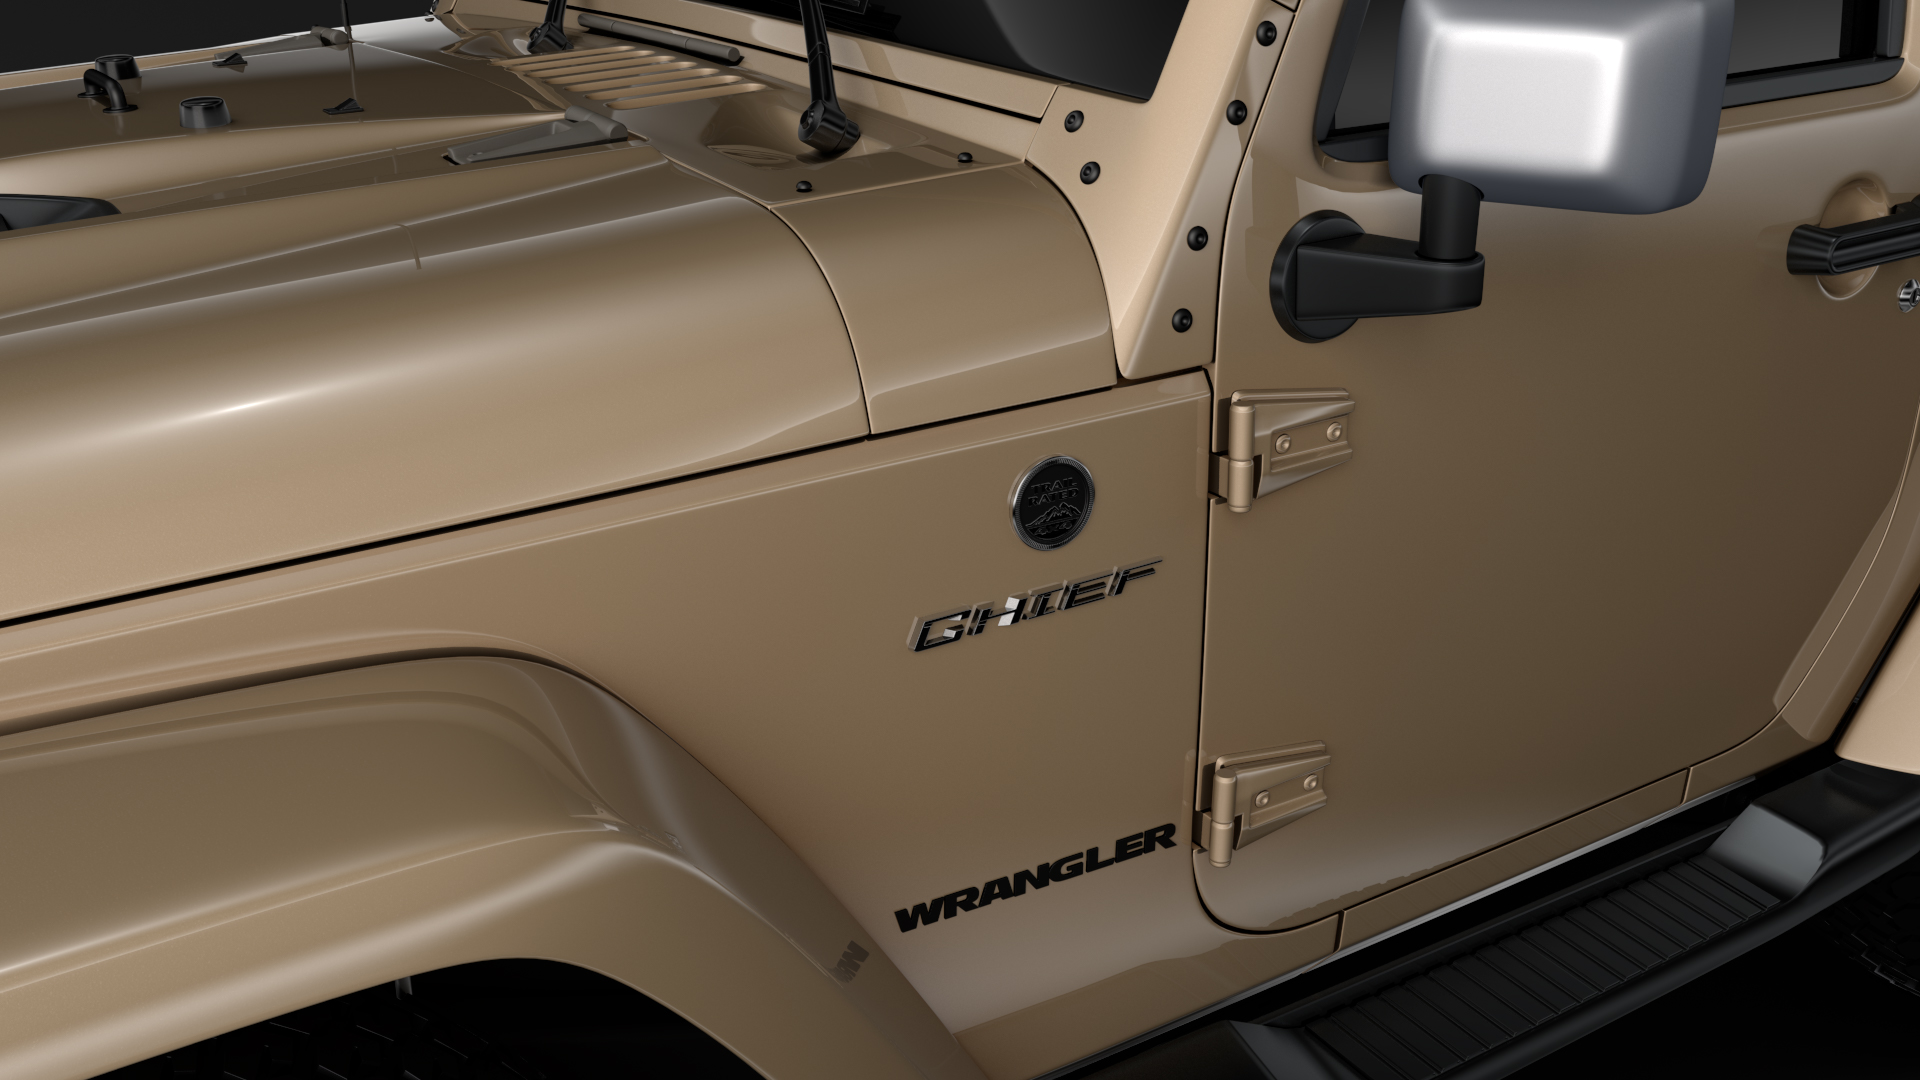 jeep wrangler chief jk 2017 3d model max fbx c4d lwo ma mb hrc xsi obj 276883